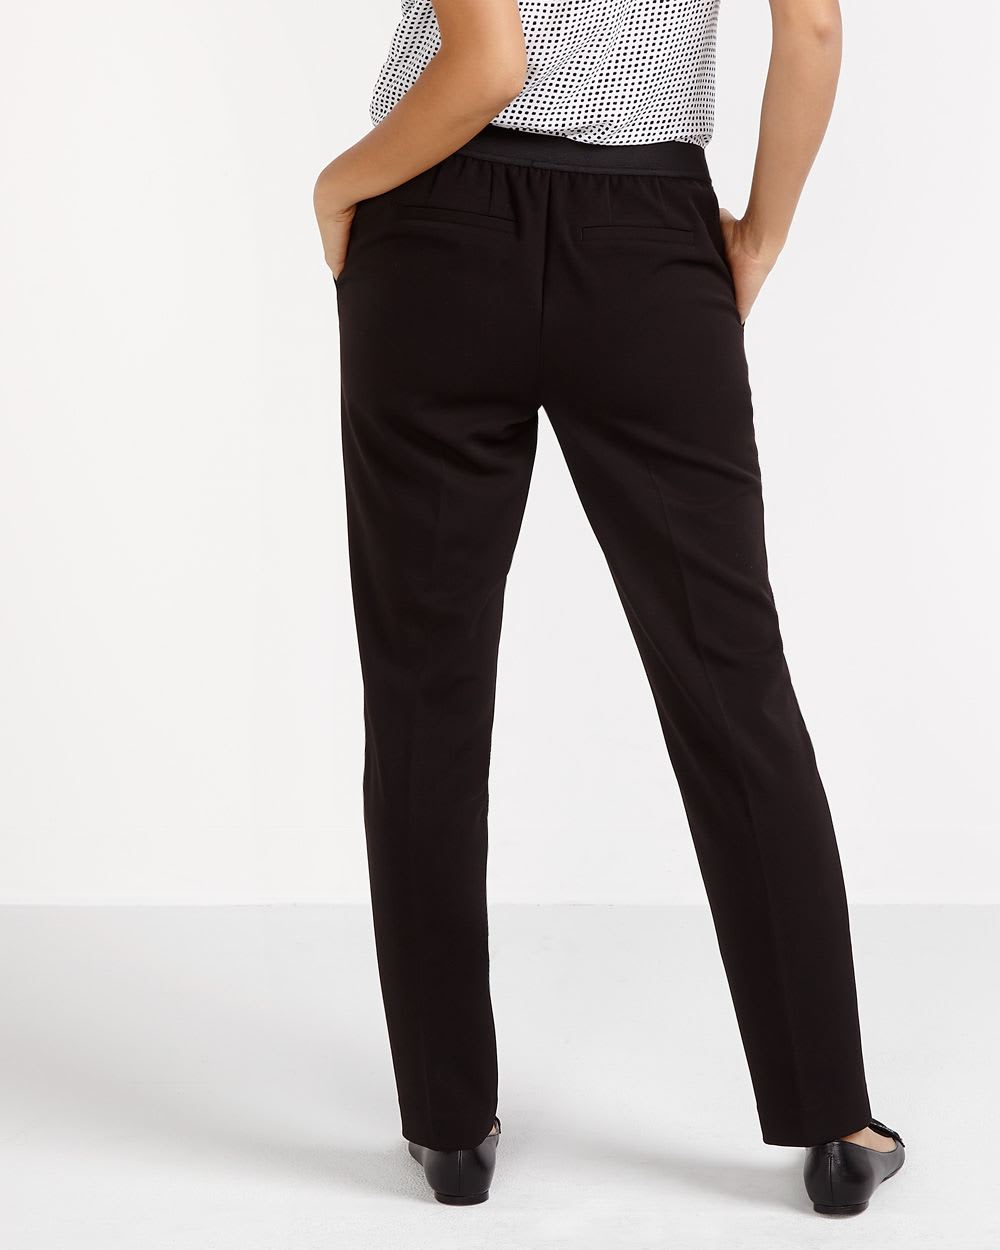 Pantalon à jambe droite